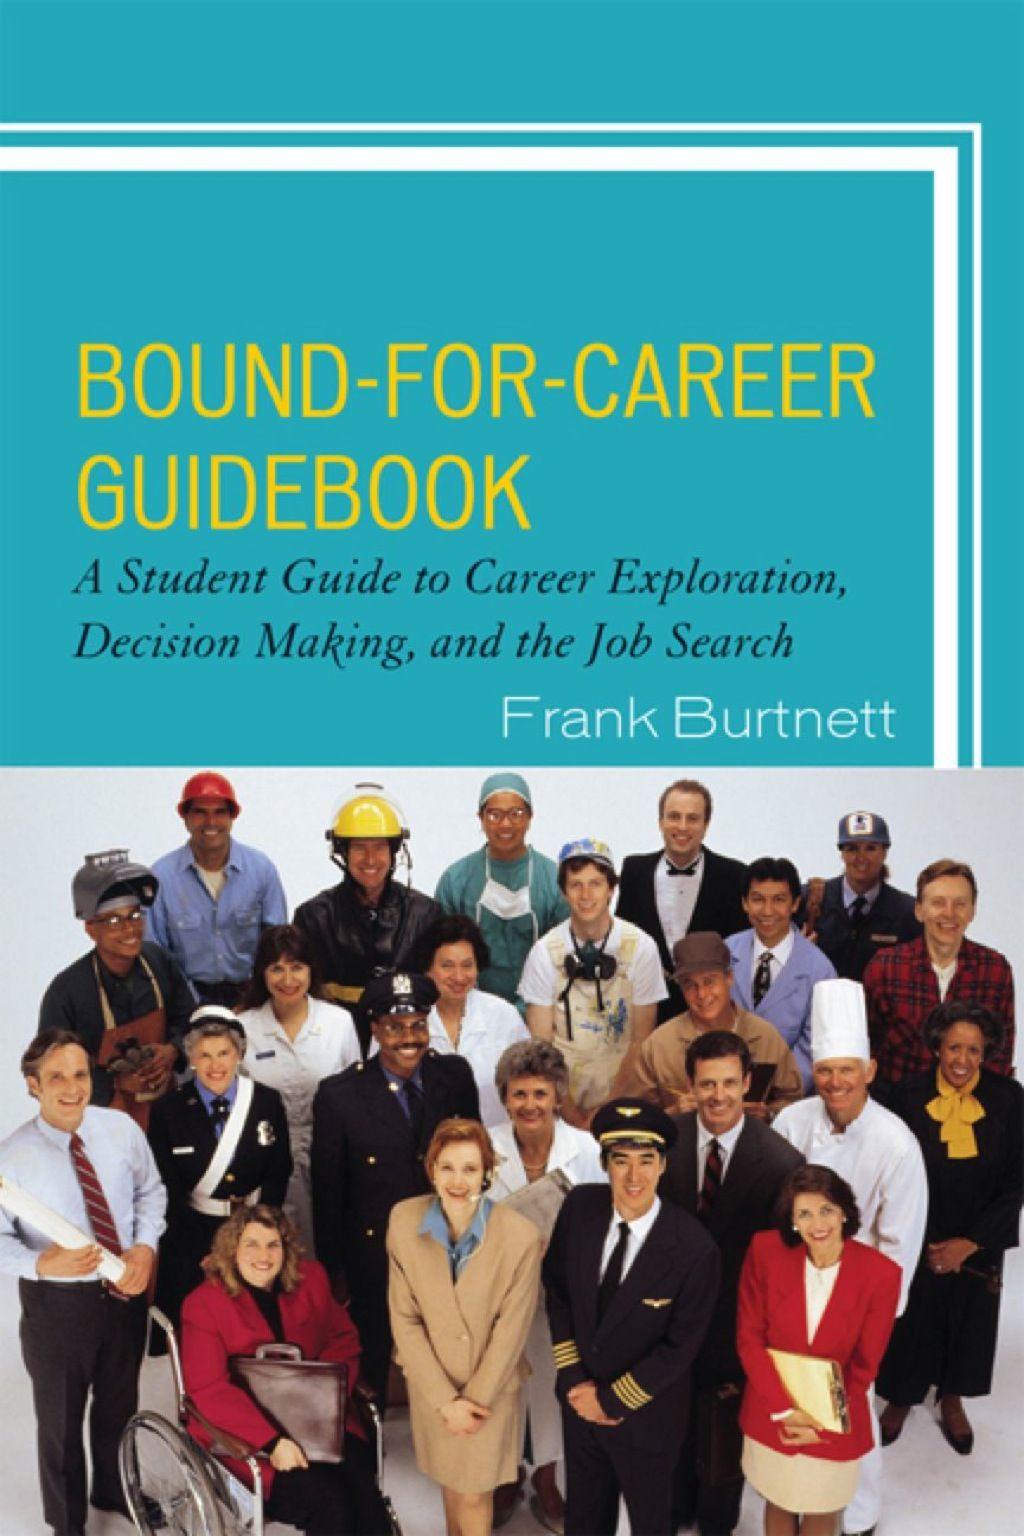 BoundforCareer Guidebook (eBook) in 2019 Student guide